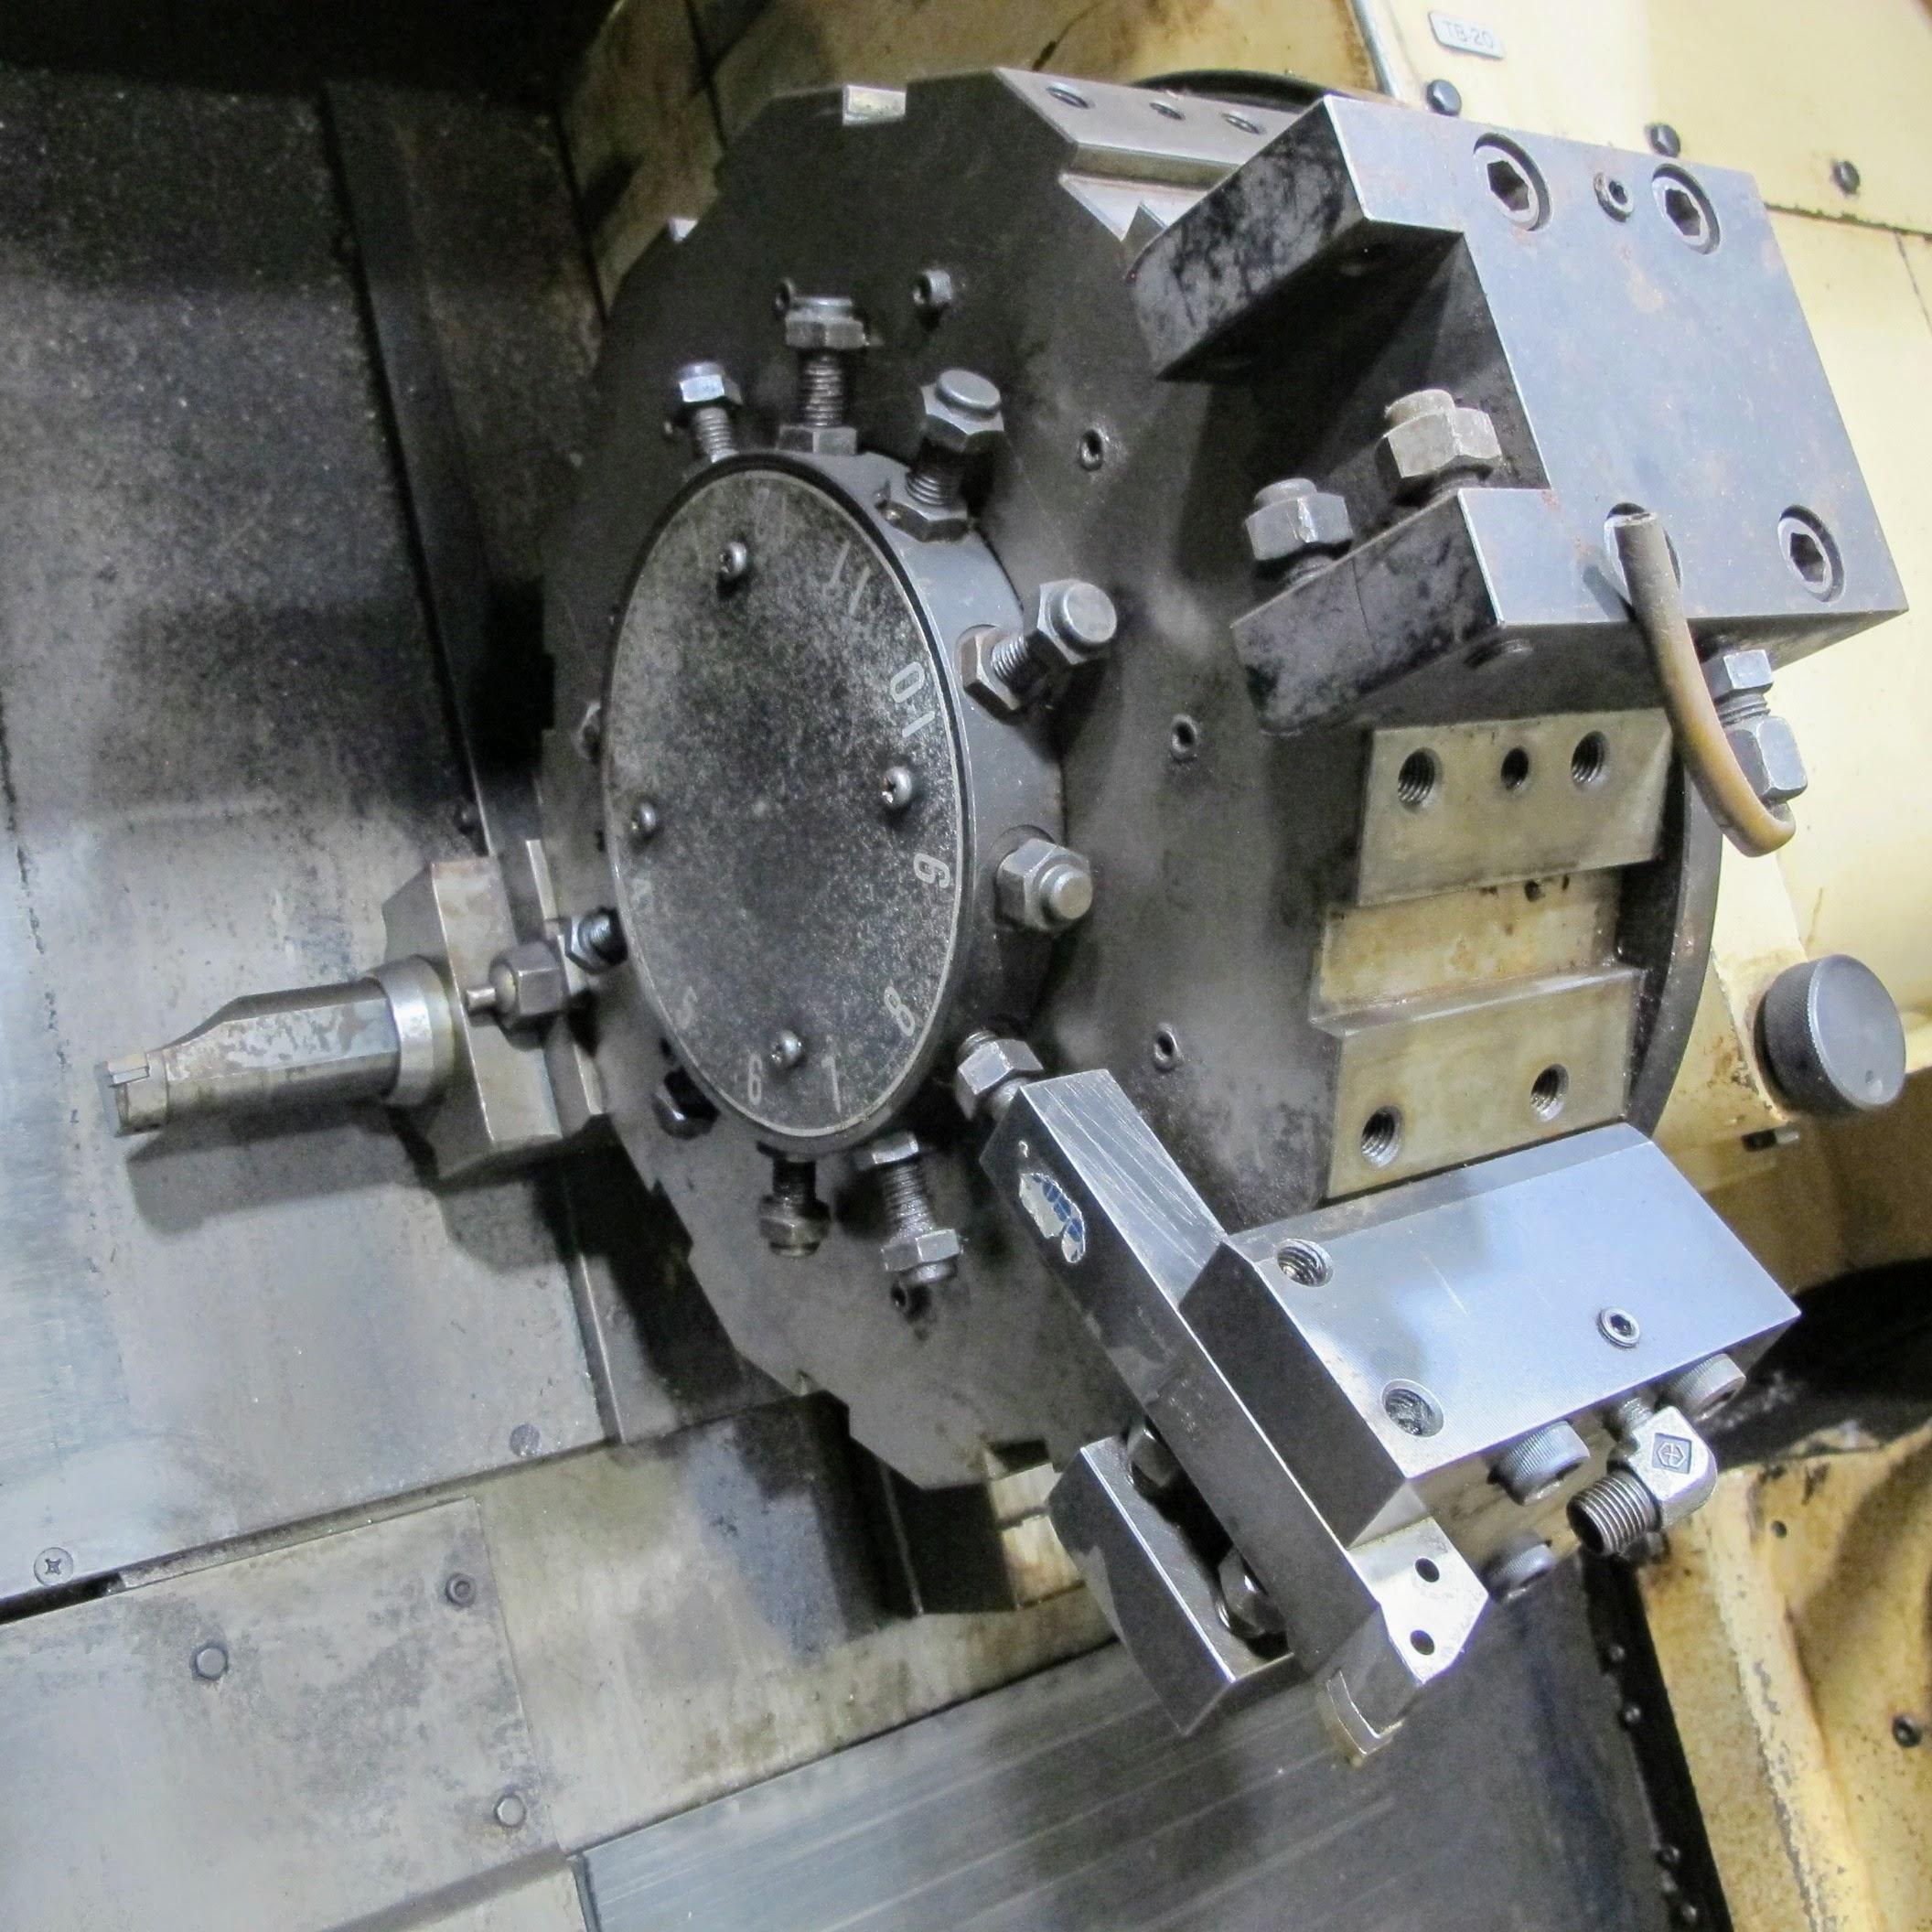 "OKUMA ACT-4 CNC LATHE W/12"" 3 JAW CHUCK, FANUC CONTROL, TAIL STOCK, ATC-12 W/10 TOOL HOLDERS, - Image 15 of 17"